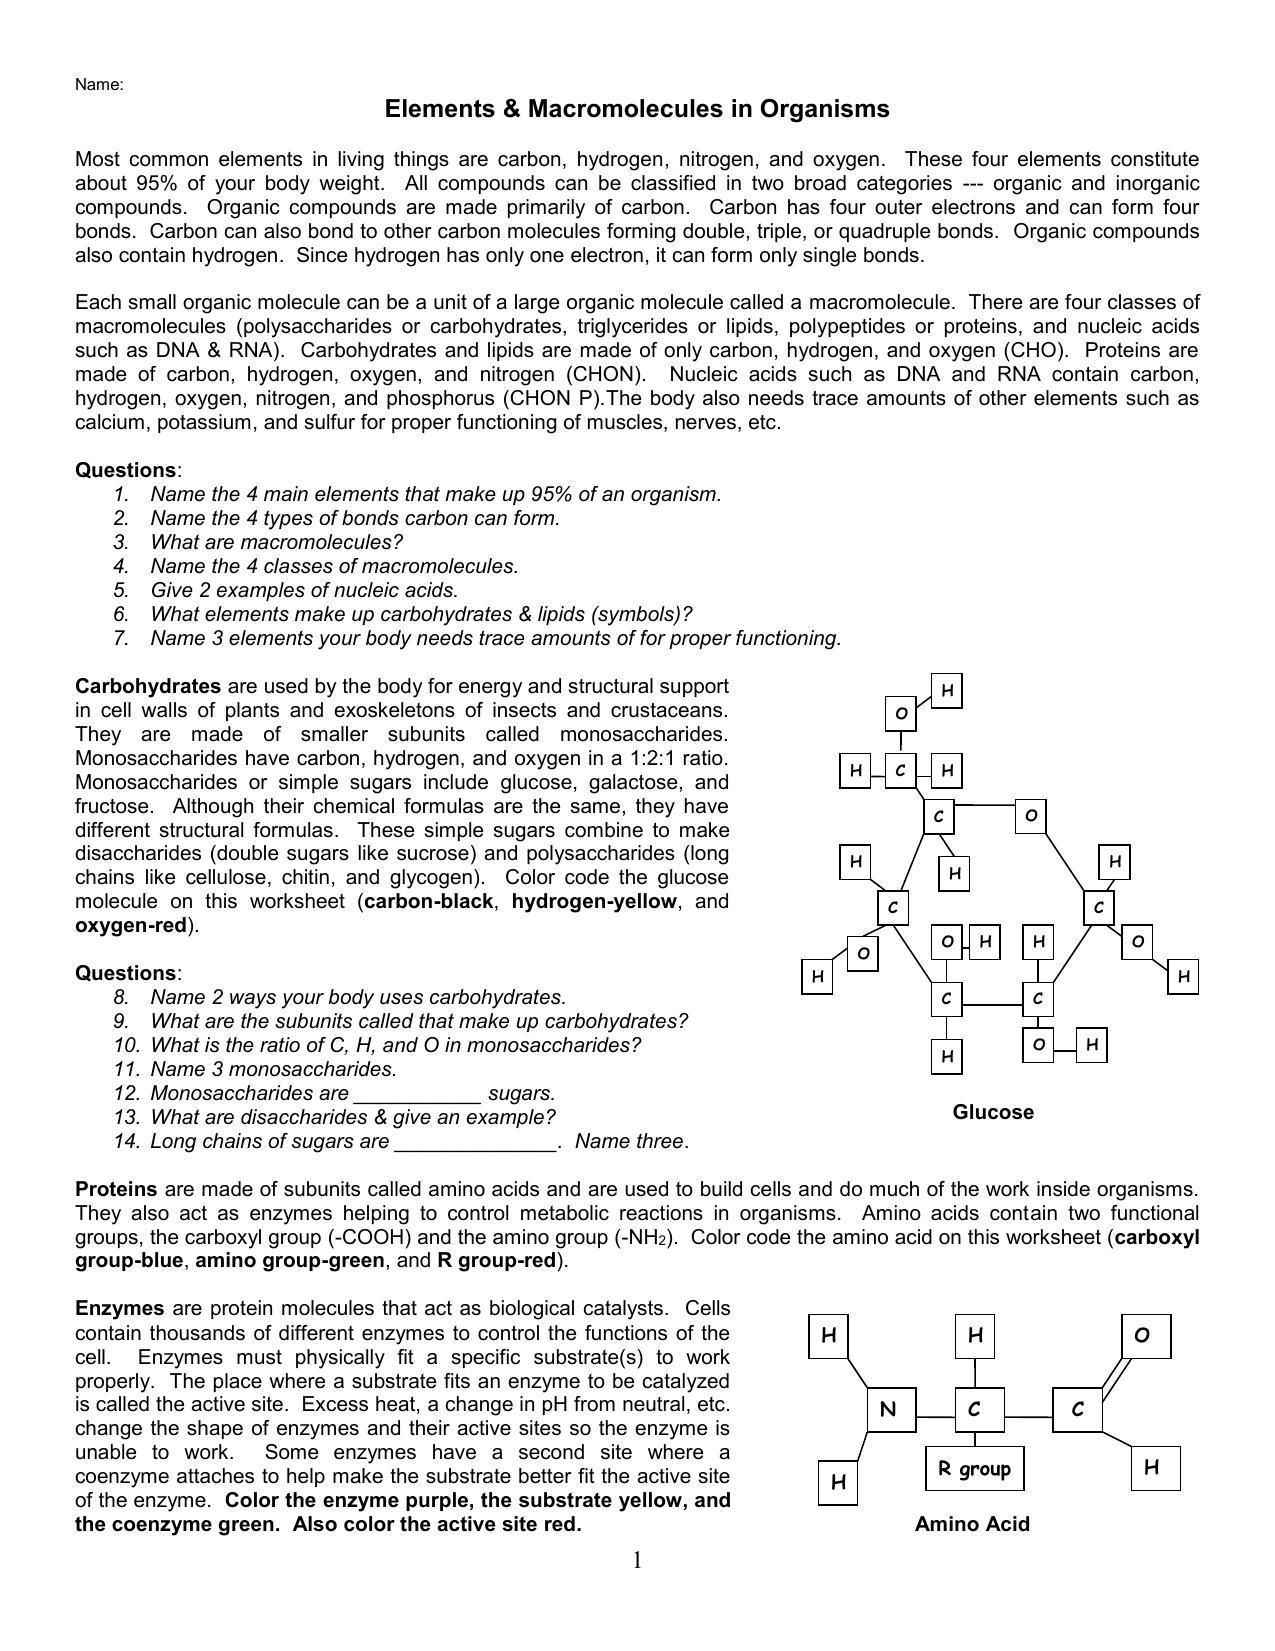 worksheet Supporting Details Worksheet organic macromolecules coloring sheet